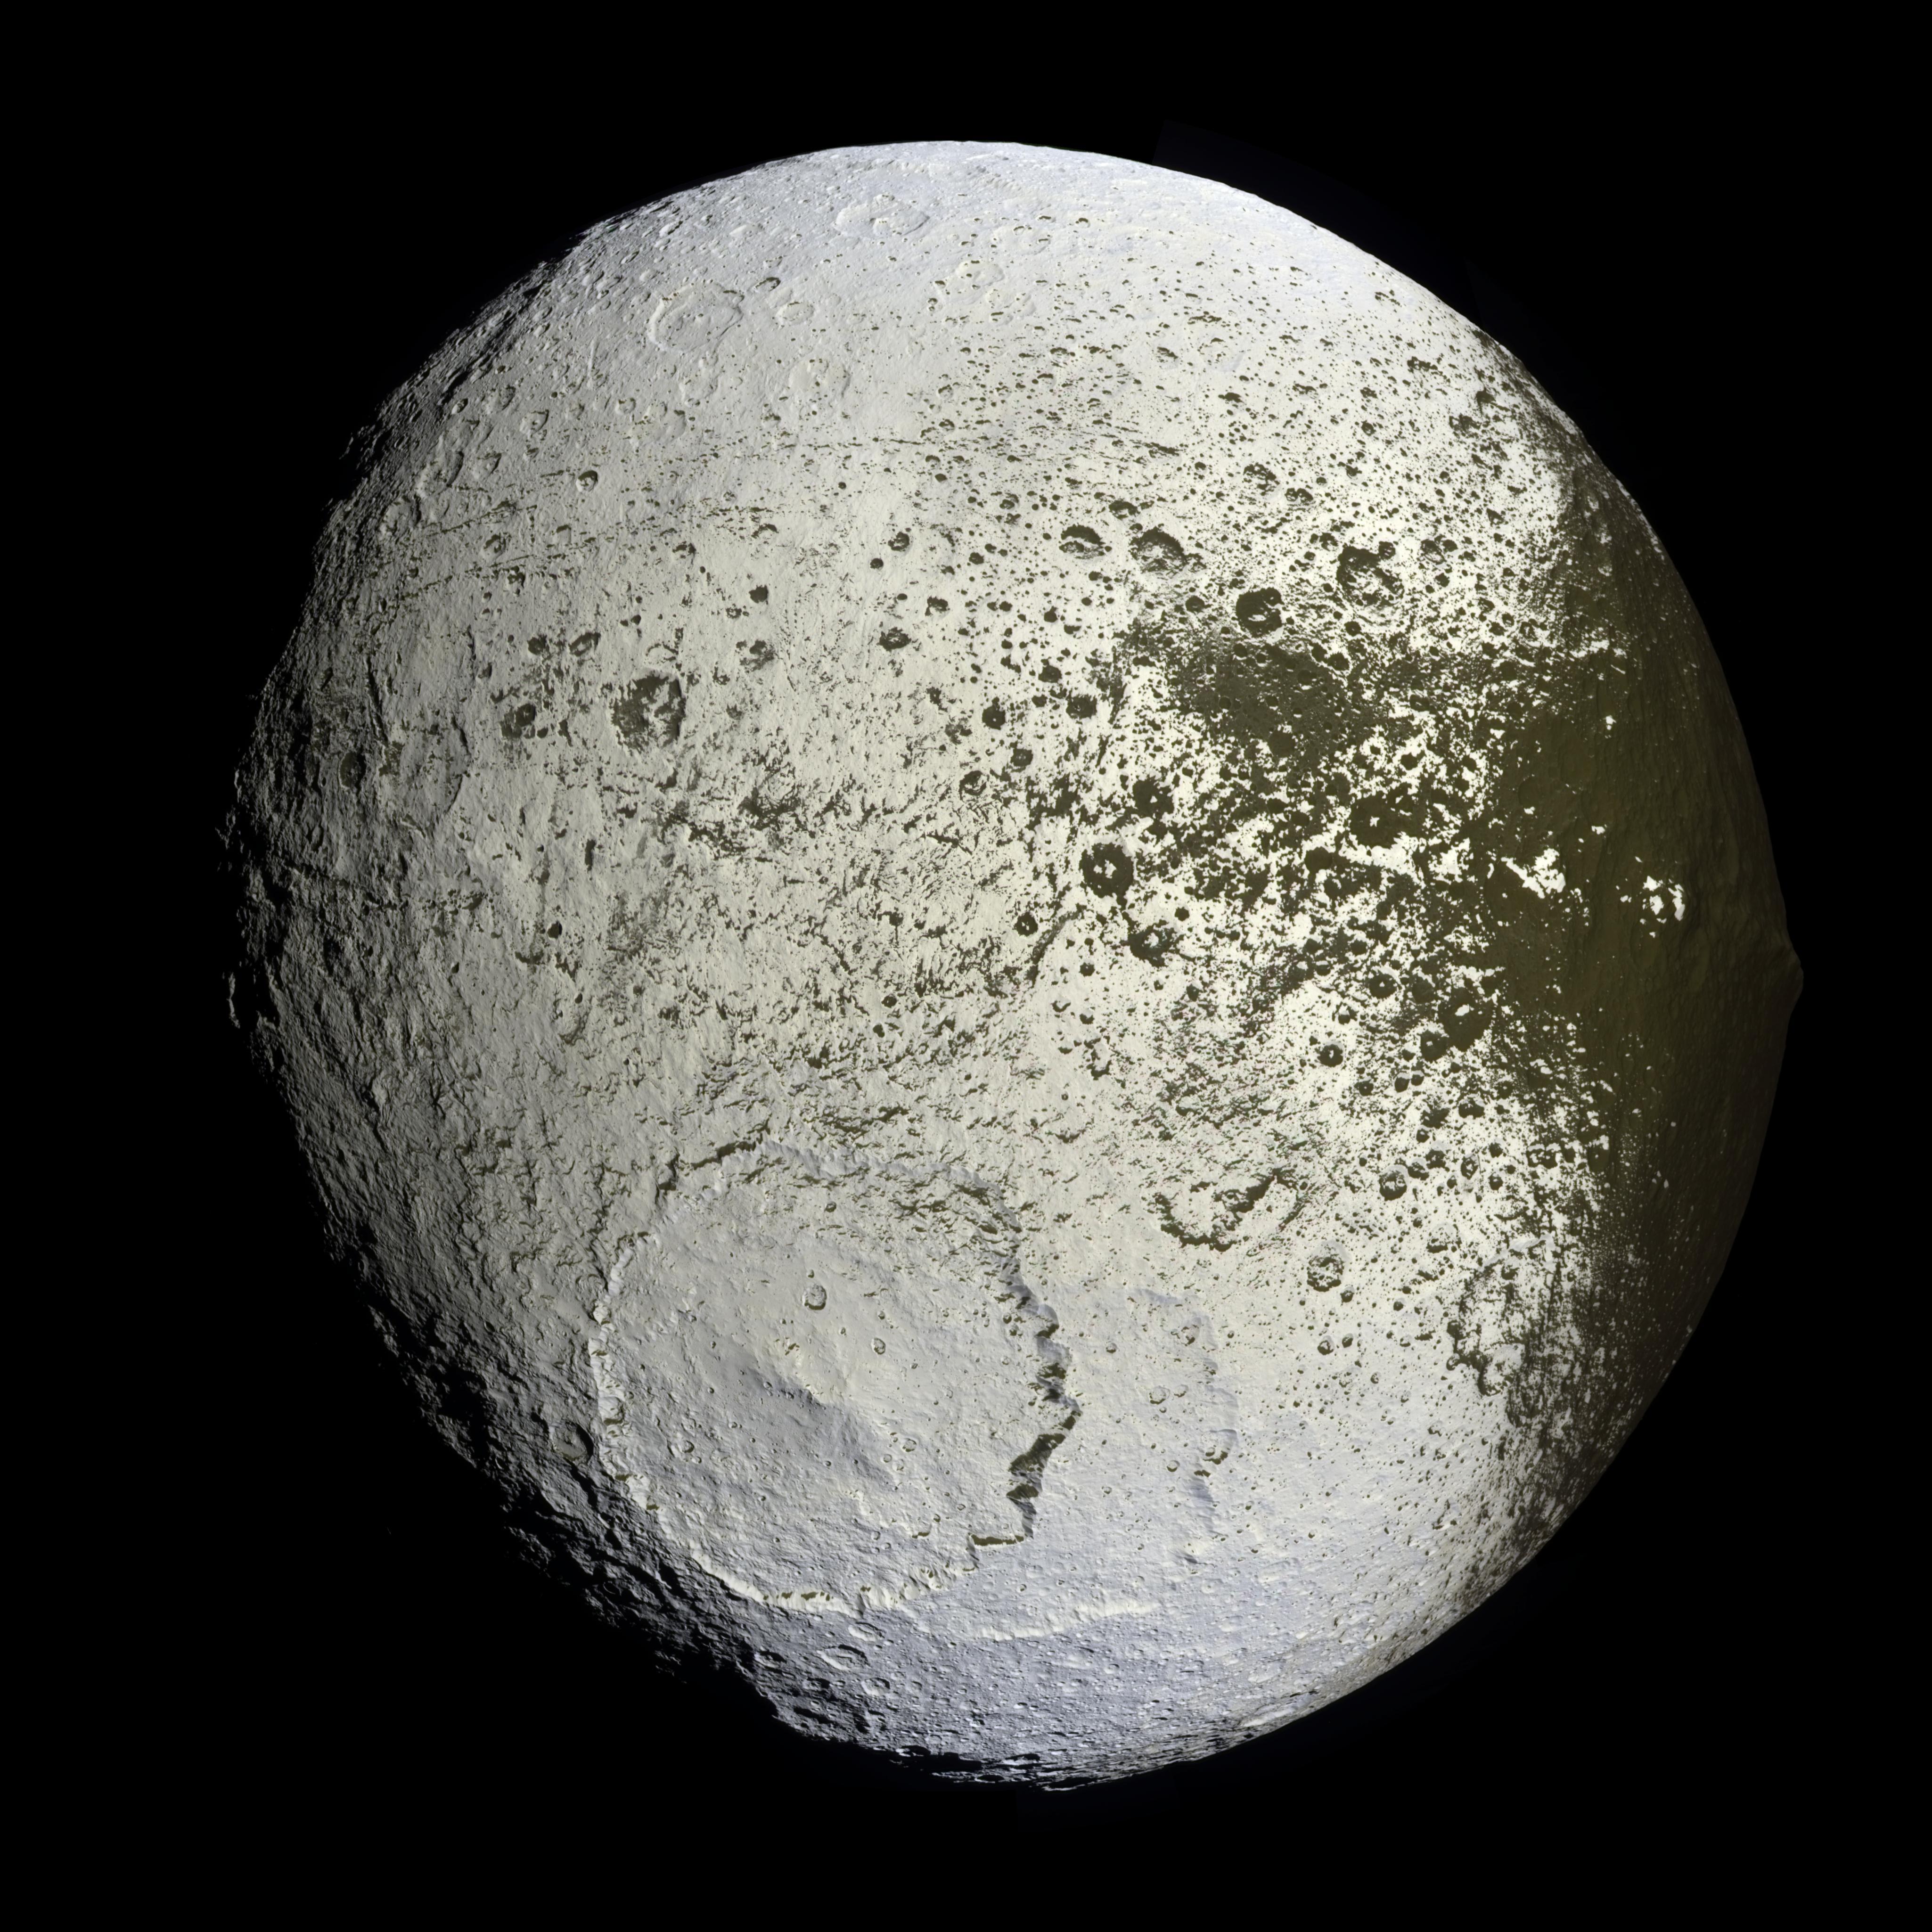 The moon Iapetus is an alien Death Star.